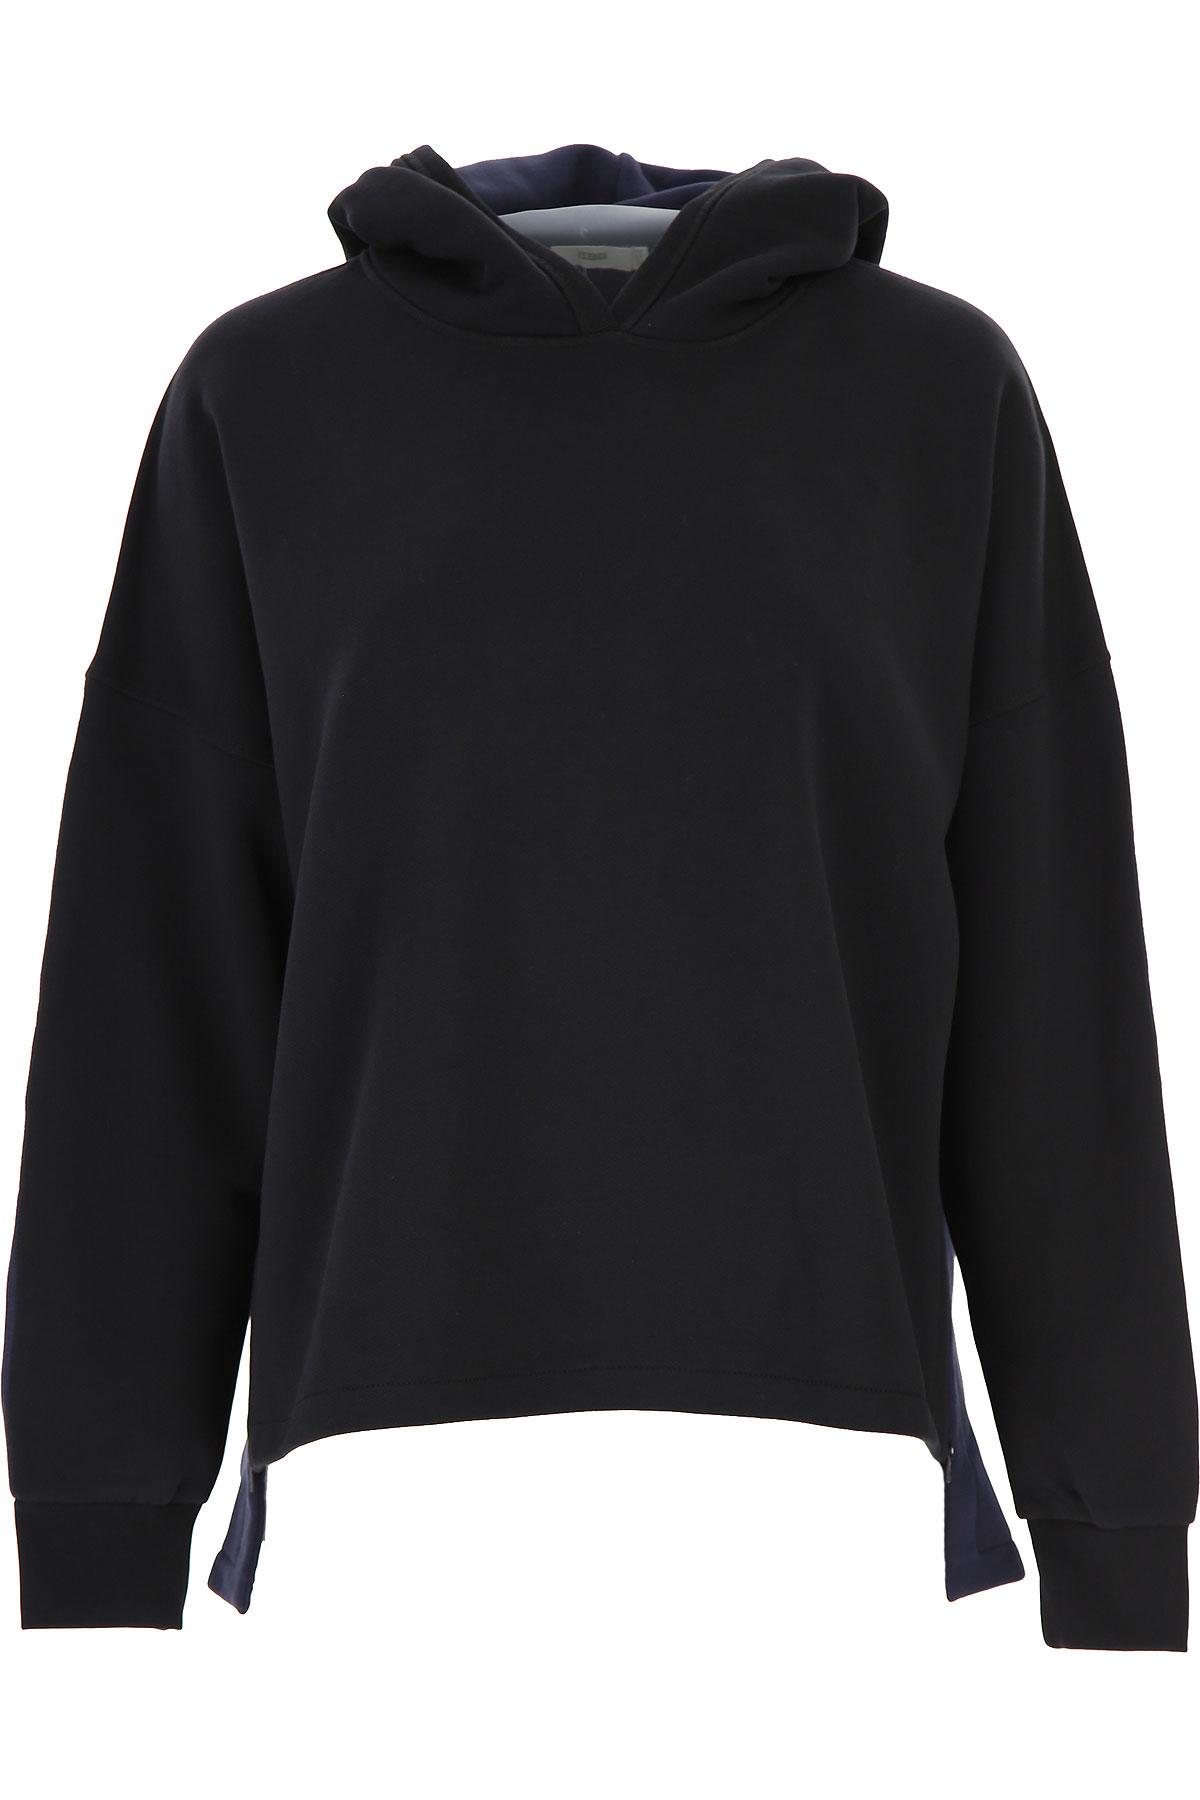 Closed Sweatshirt for Women On Sale, Black, Cotton, 2019, 2 4